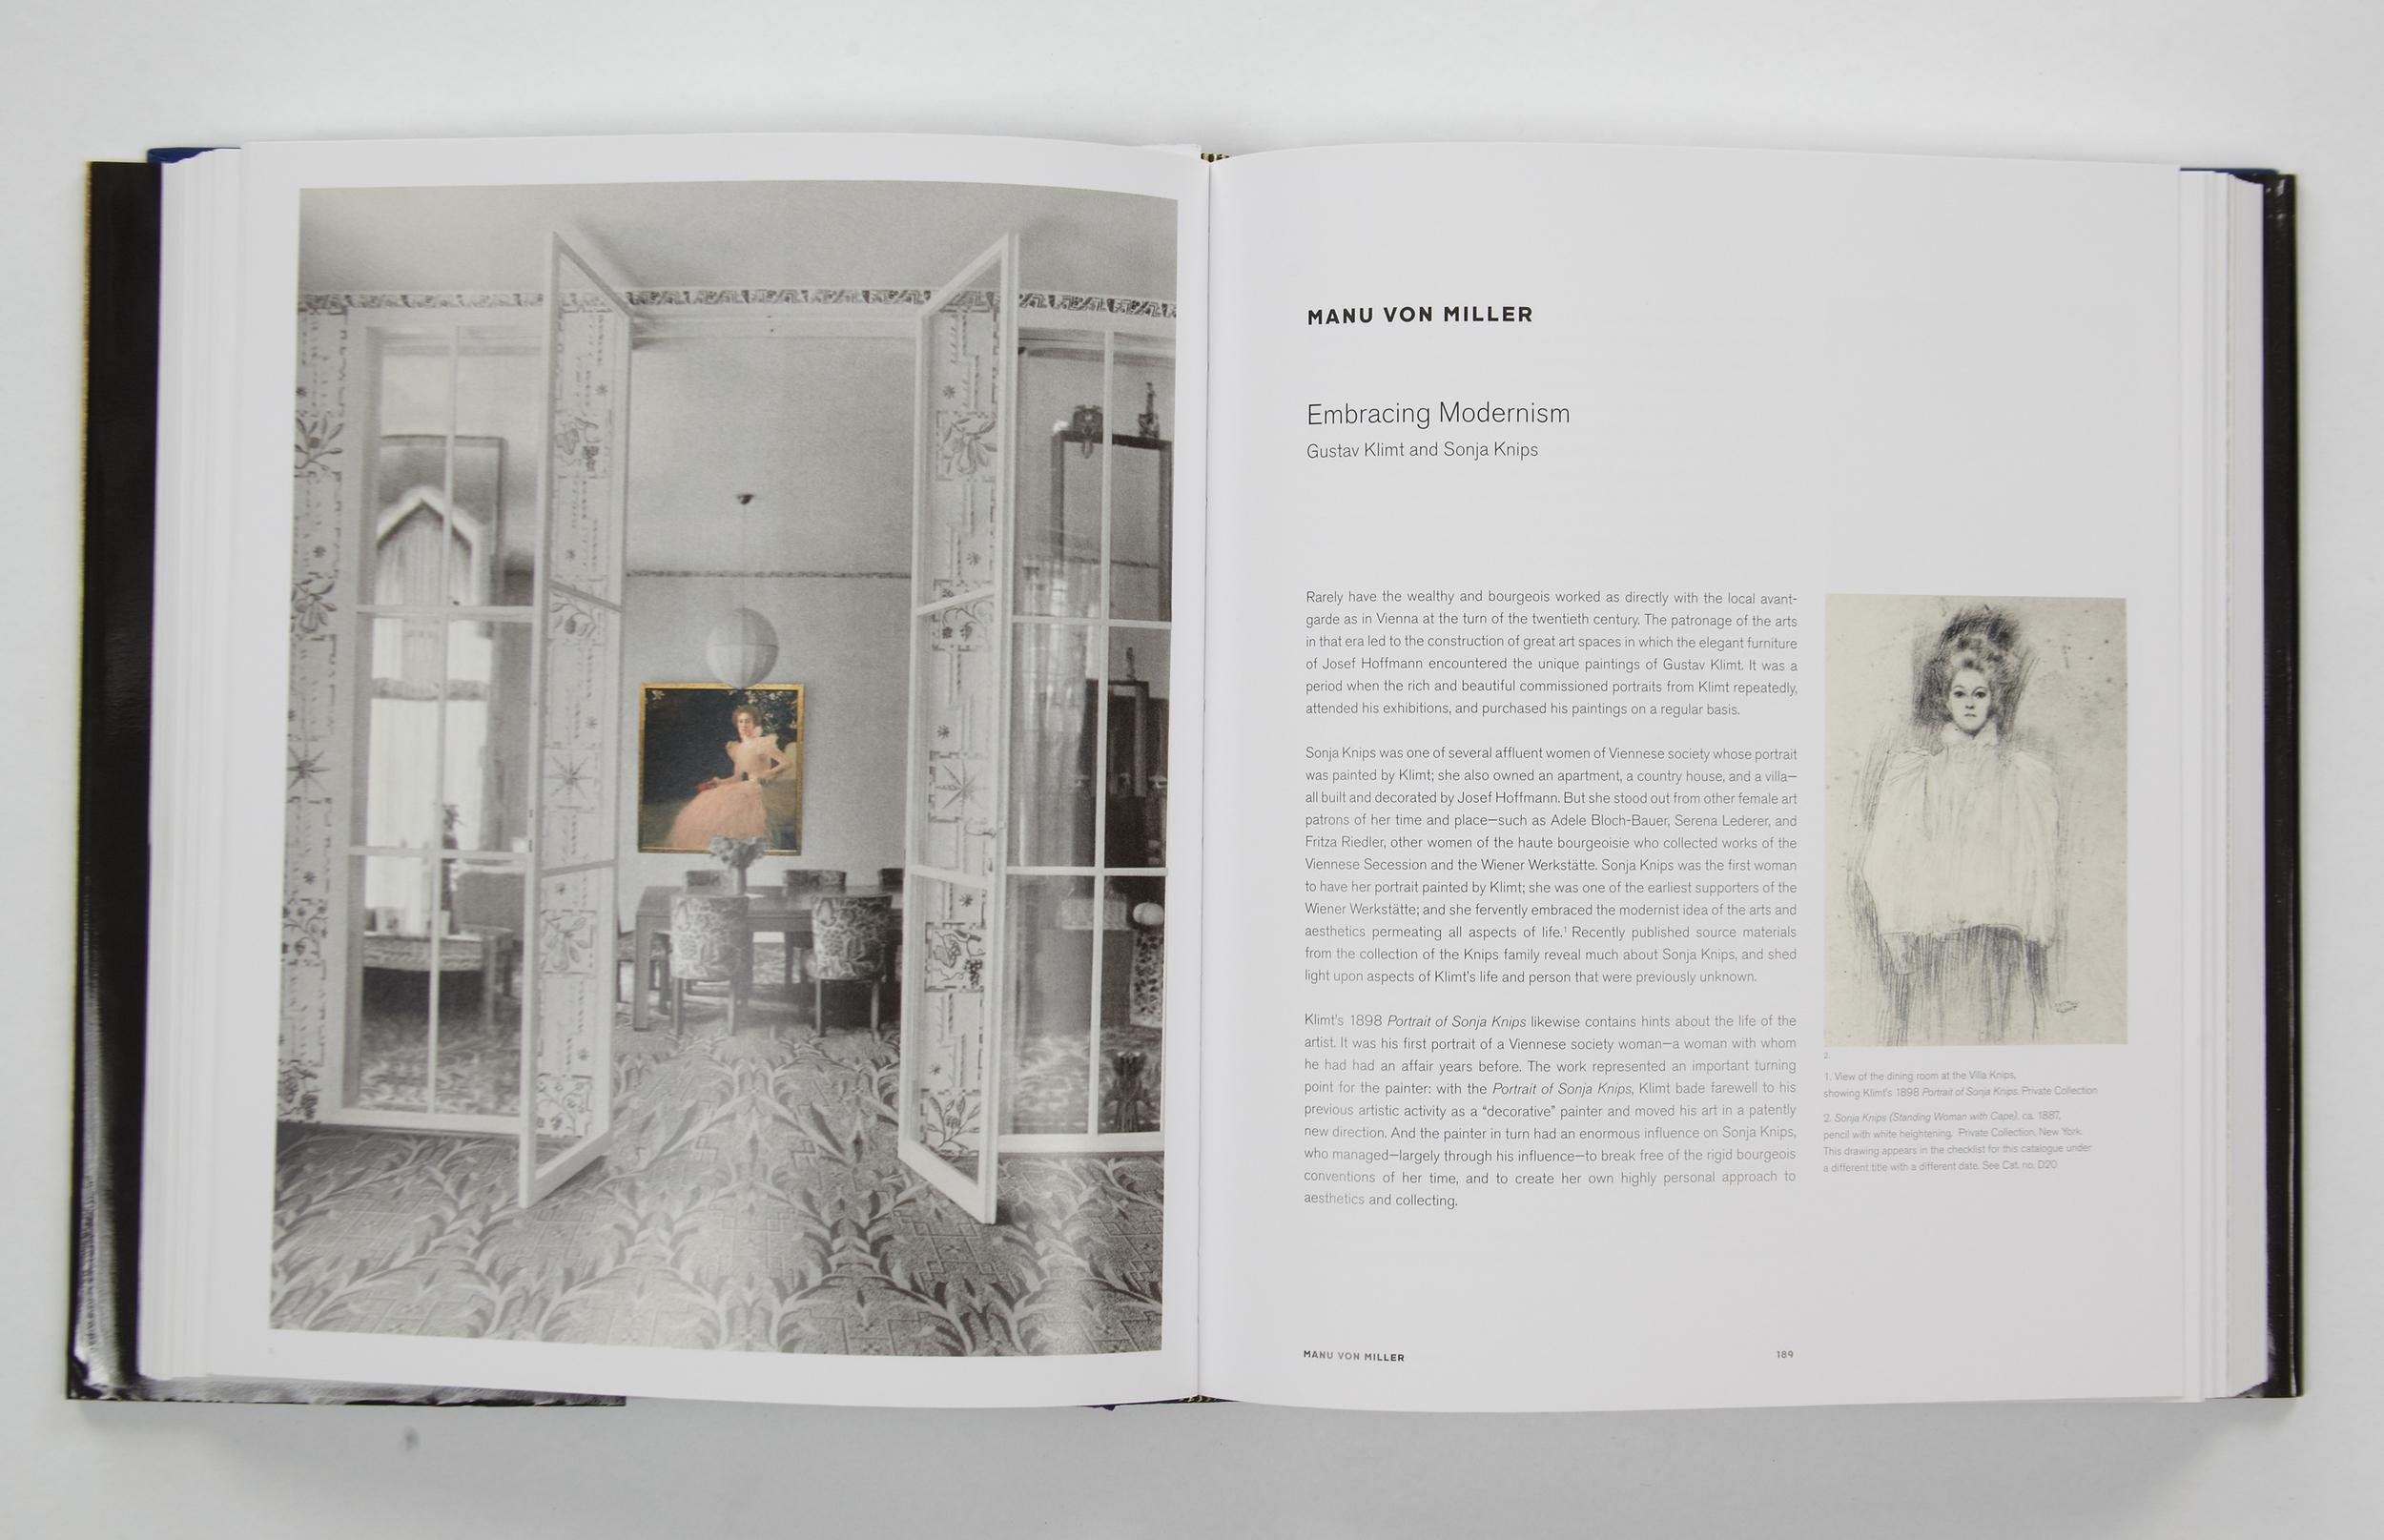 MG_Klimt_bookpost__0010_TSE_Invitations__586.jpg.jpg